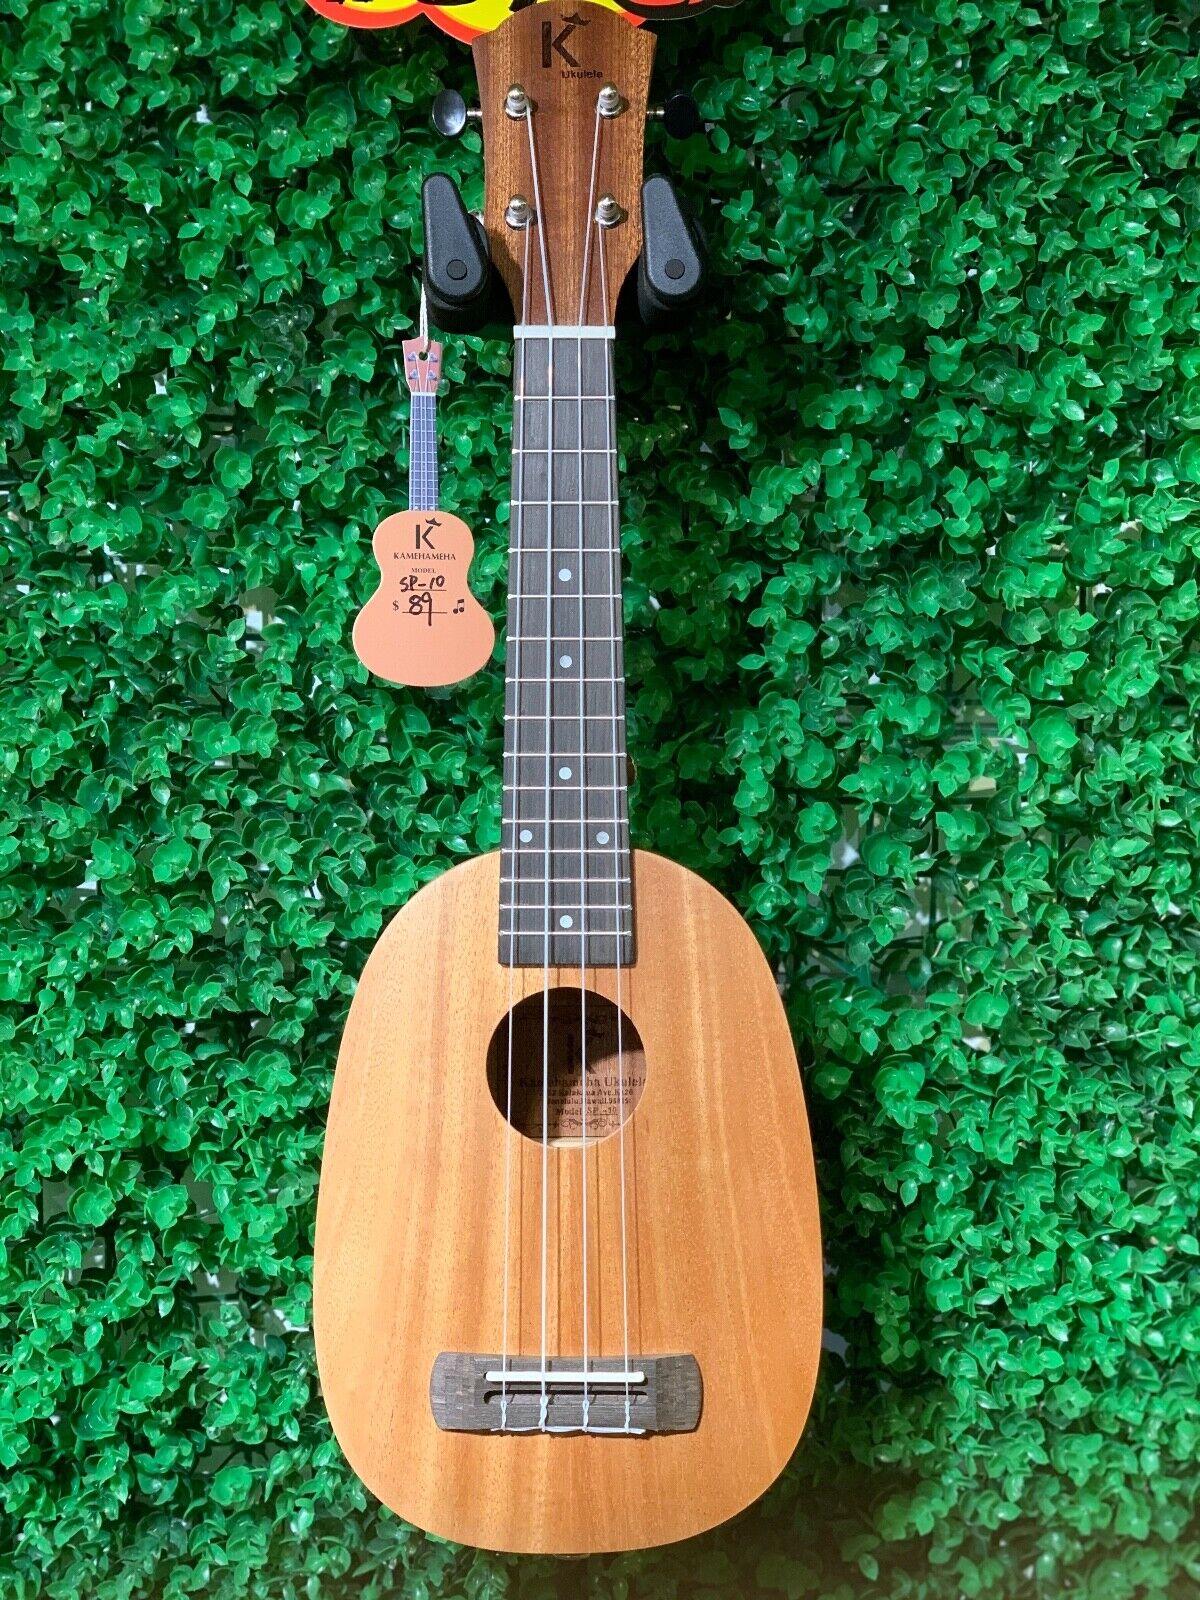 Soprano Ukulele Case Summer Poncho By Phitz For Sale Online Ebay